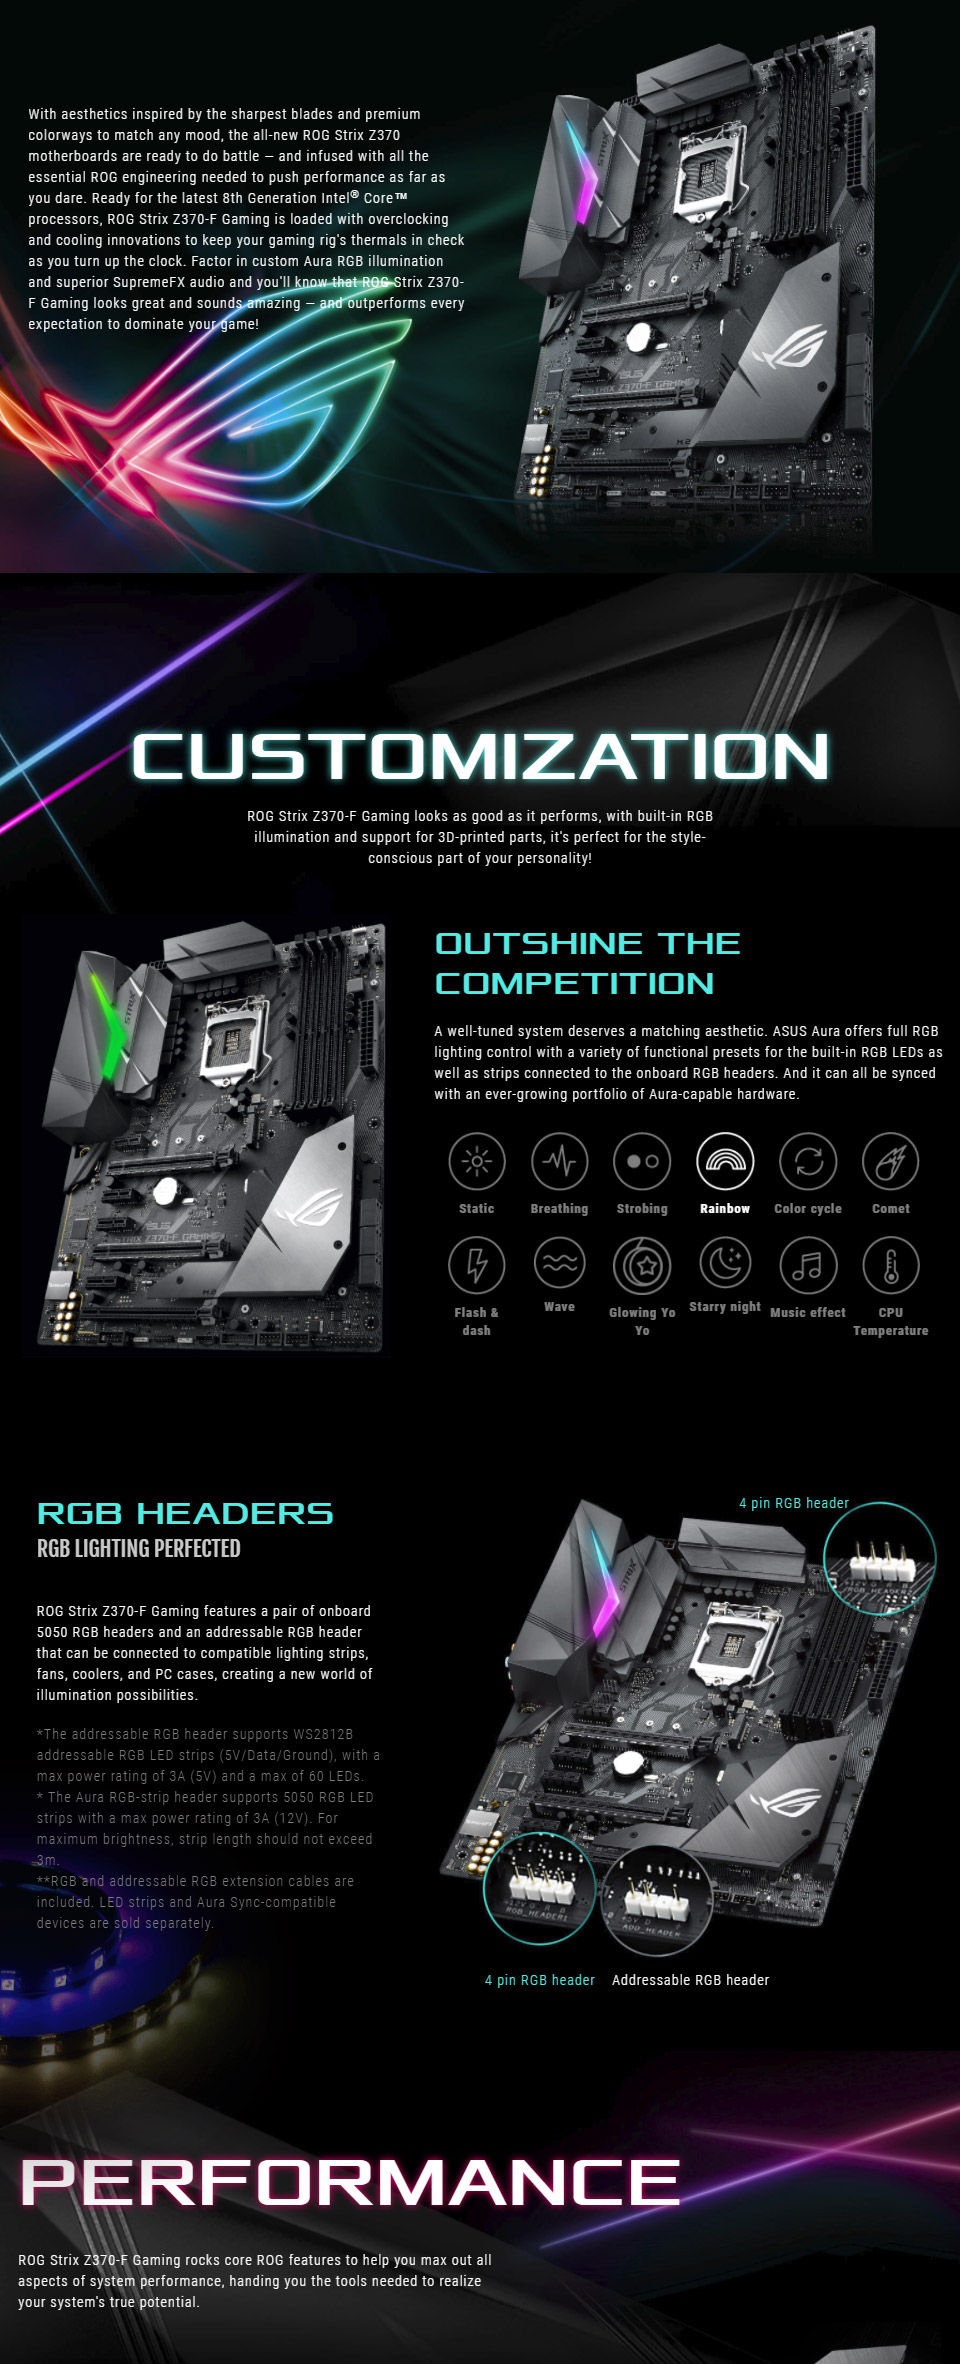 Asus ROG STRIX Z370 F GAMING Coffee Lake LGA1151 Motherboard | PrestoMall -  Motherboards